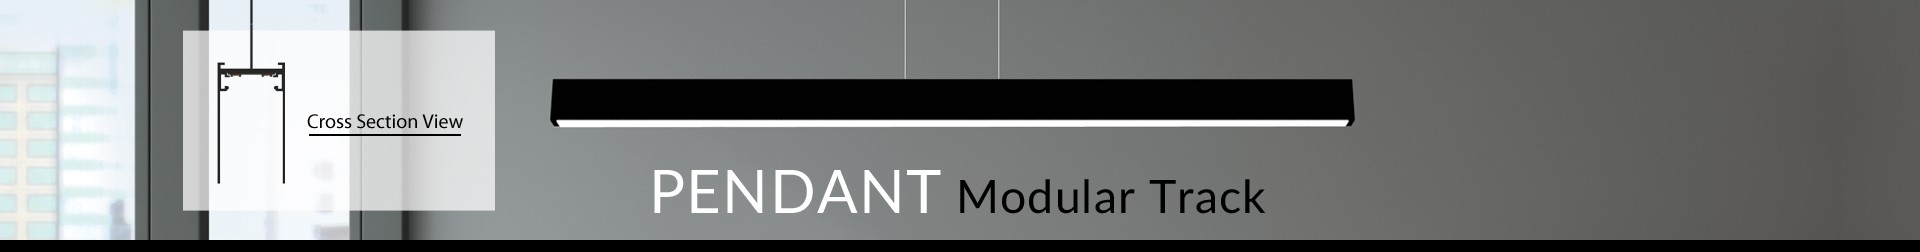 "1.5"" Pendant Modular Track"